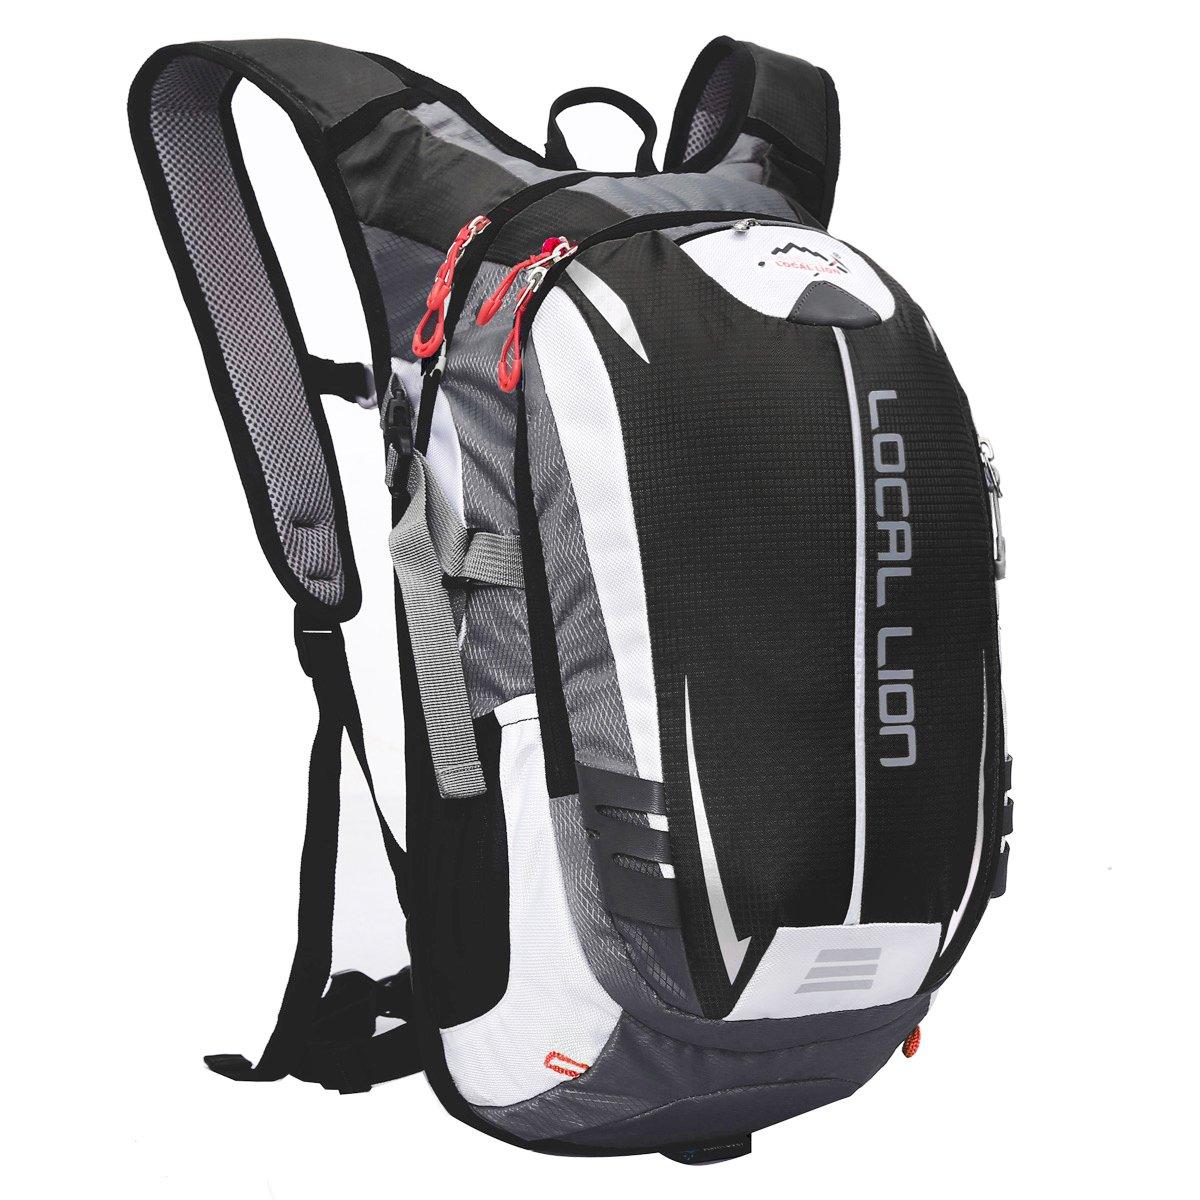 LOCALLION Biking Backpack Cycling Backpack Riding Backpack Bike Rucksack  Outdoor Sports Daypack for Running Hiking Camping Travelling Ultralight Men  Women ... 0cae70956